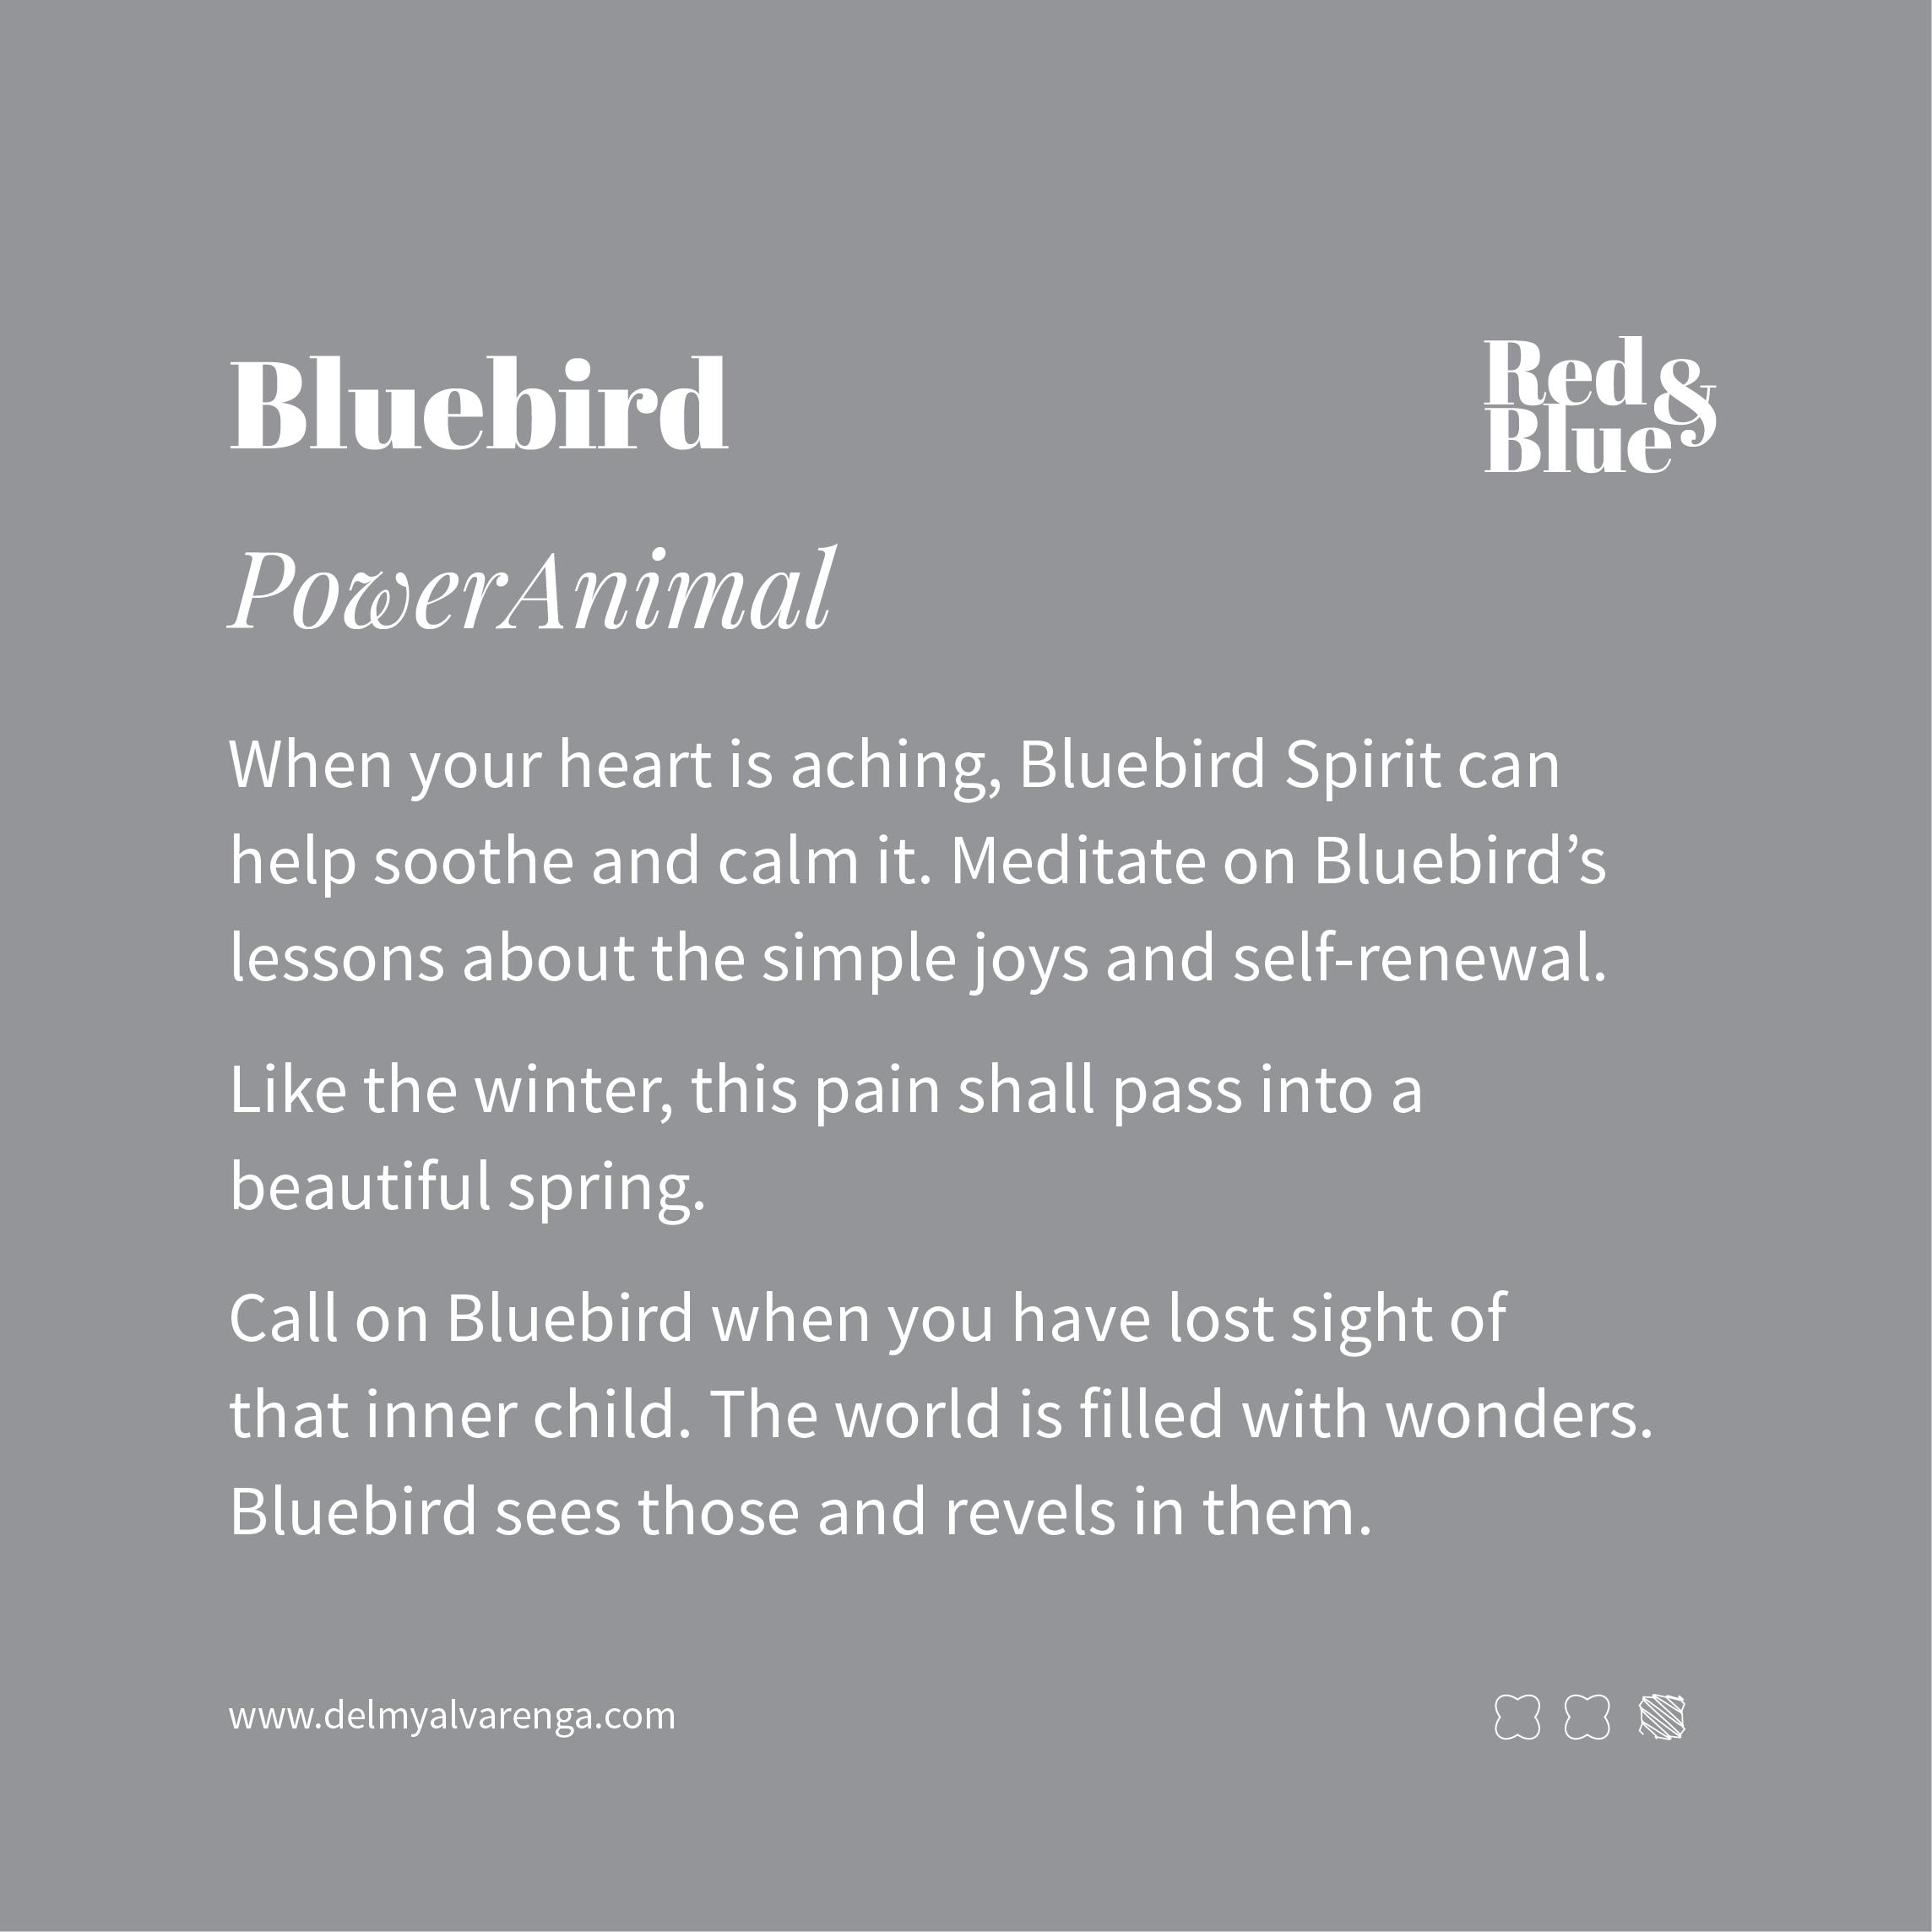 Bluebird Power Animal